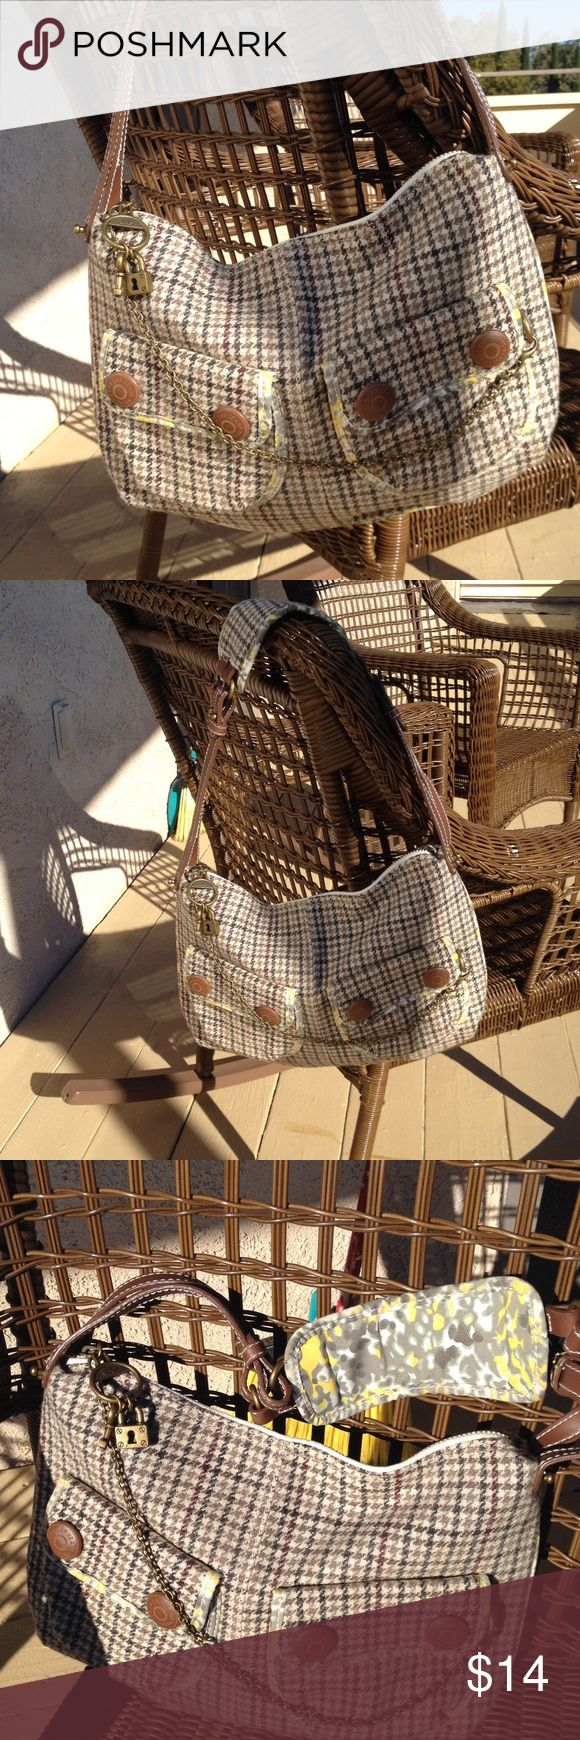 GAP Shoulder Bag Nice sized, like new, tartan style plaid nice for fall. GAP Bags Shoulder Bags